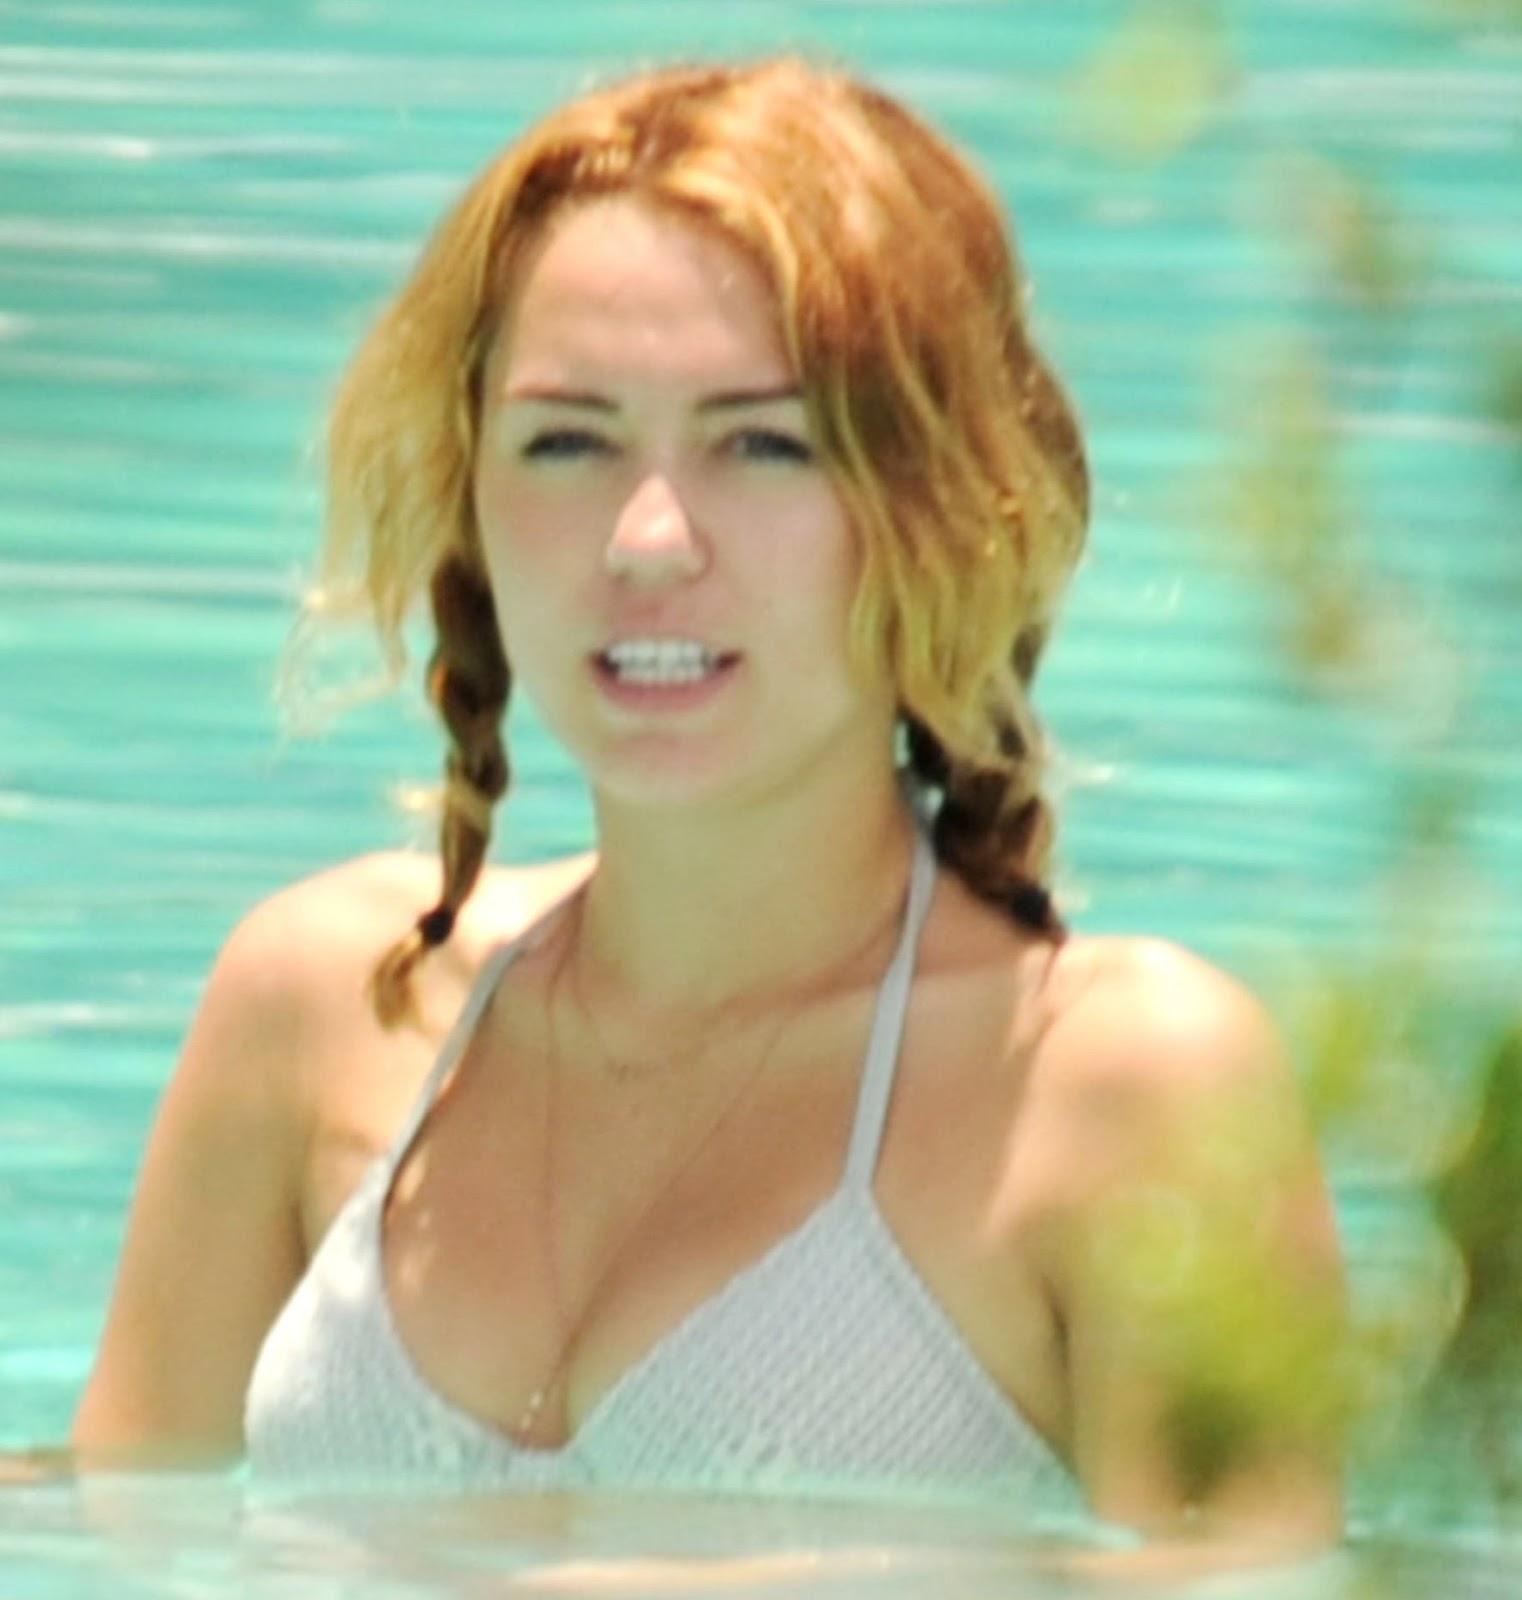 http://4.bp.blogspot.com/-I0rAP0BVkOY/T9kfOujygvI/AAAAAAAAF7A/F4gNRaHn4iU/s1600/Miley-Cyrus-Bikini-29.jpg